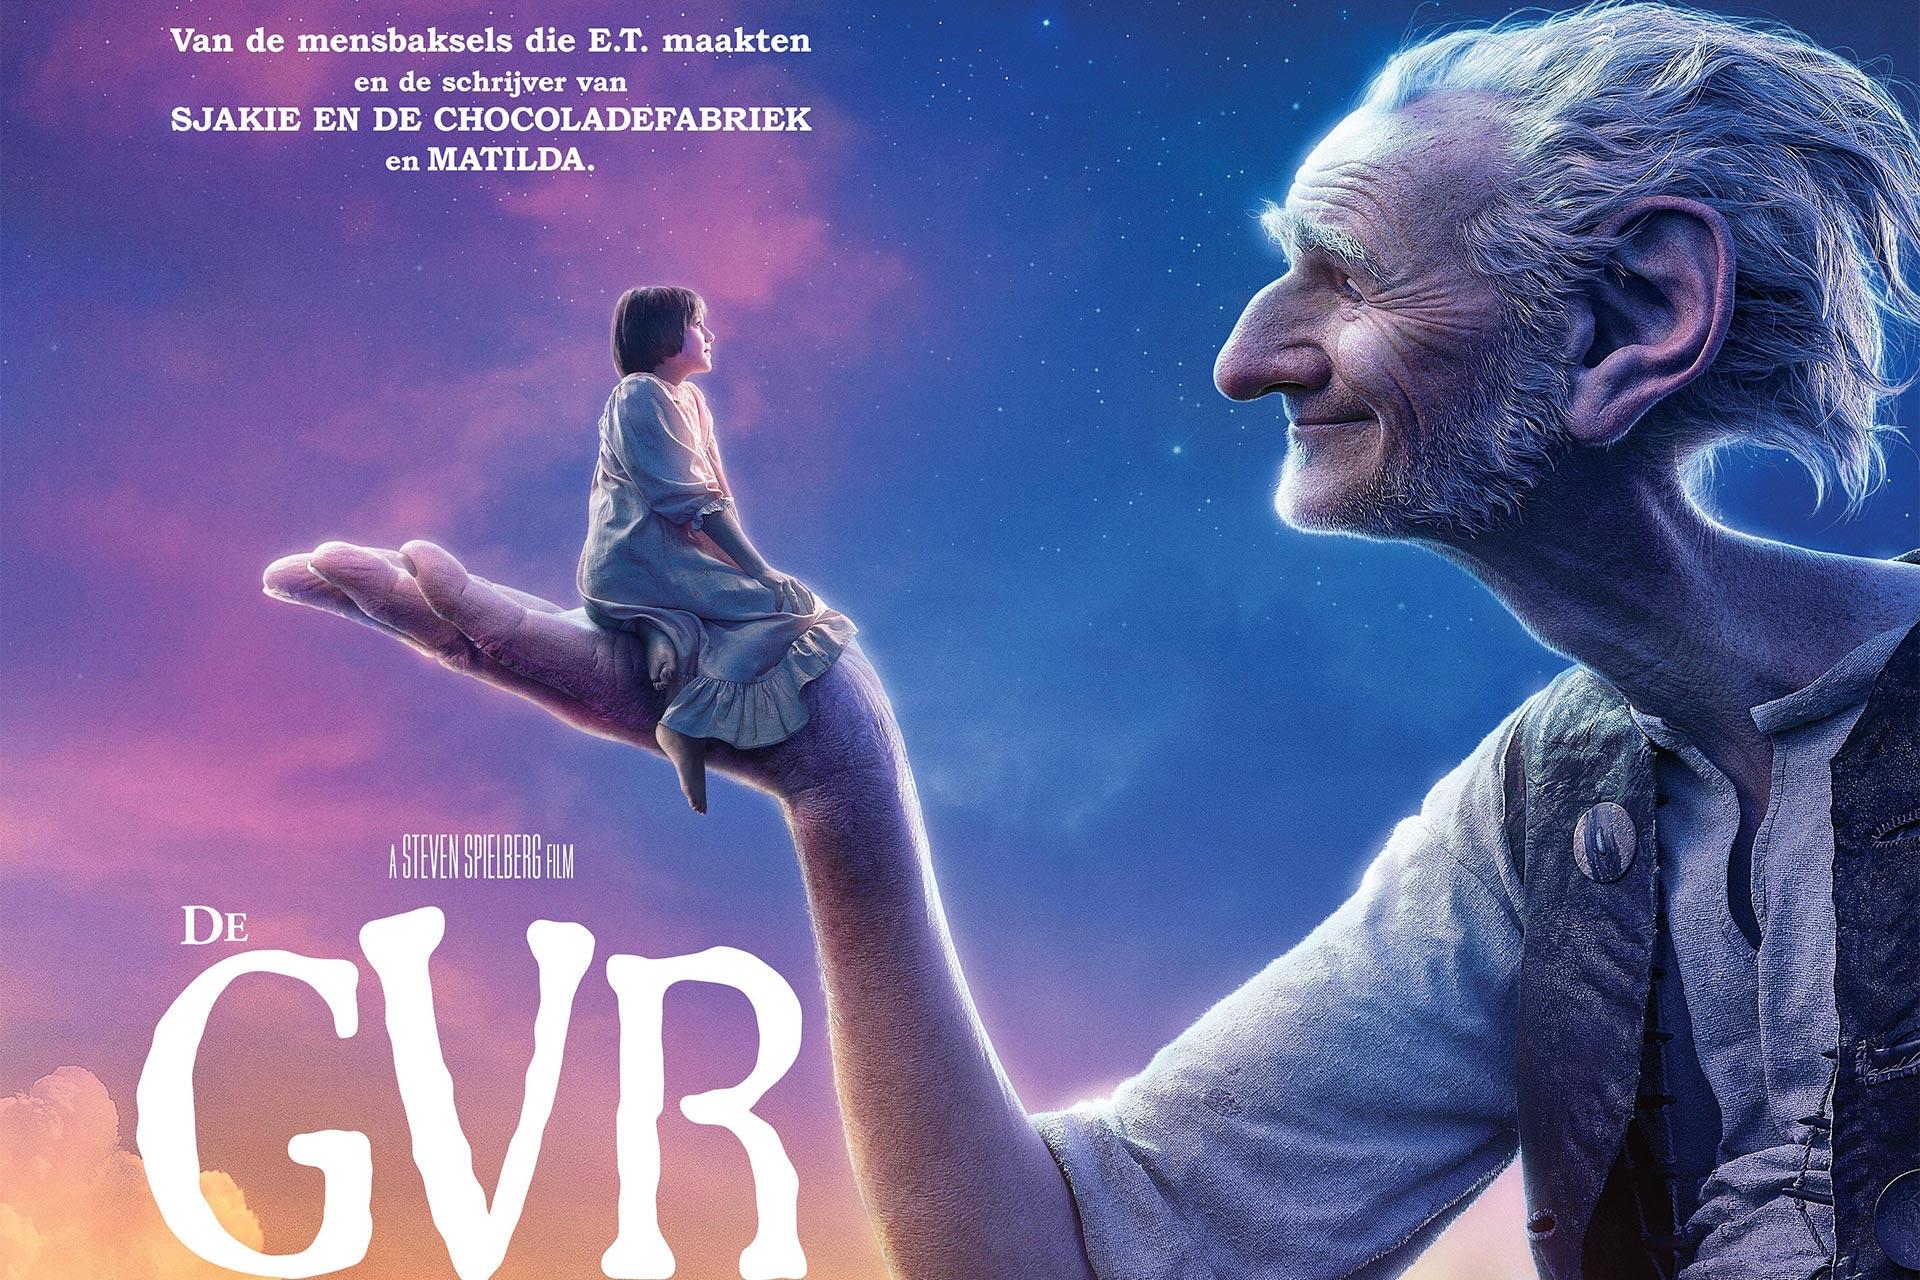 De GVR poster